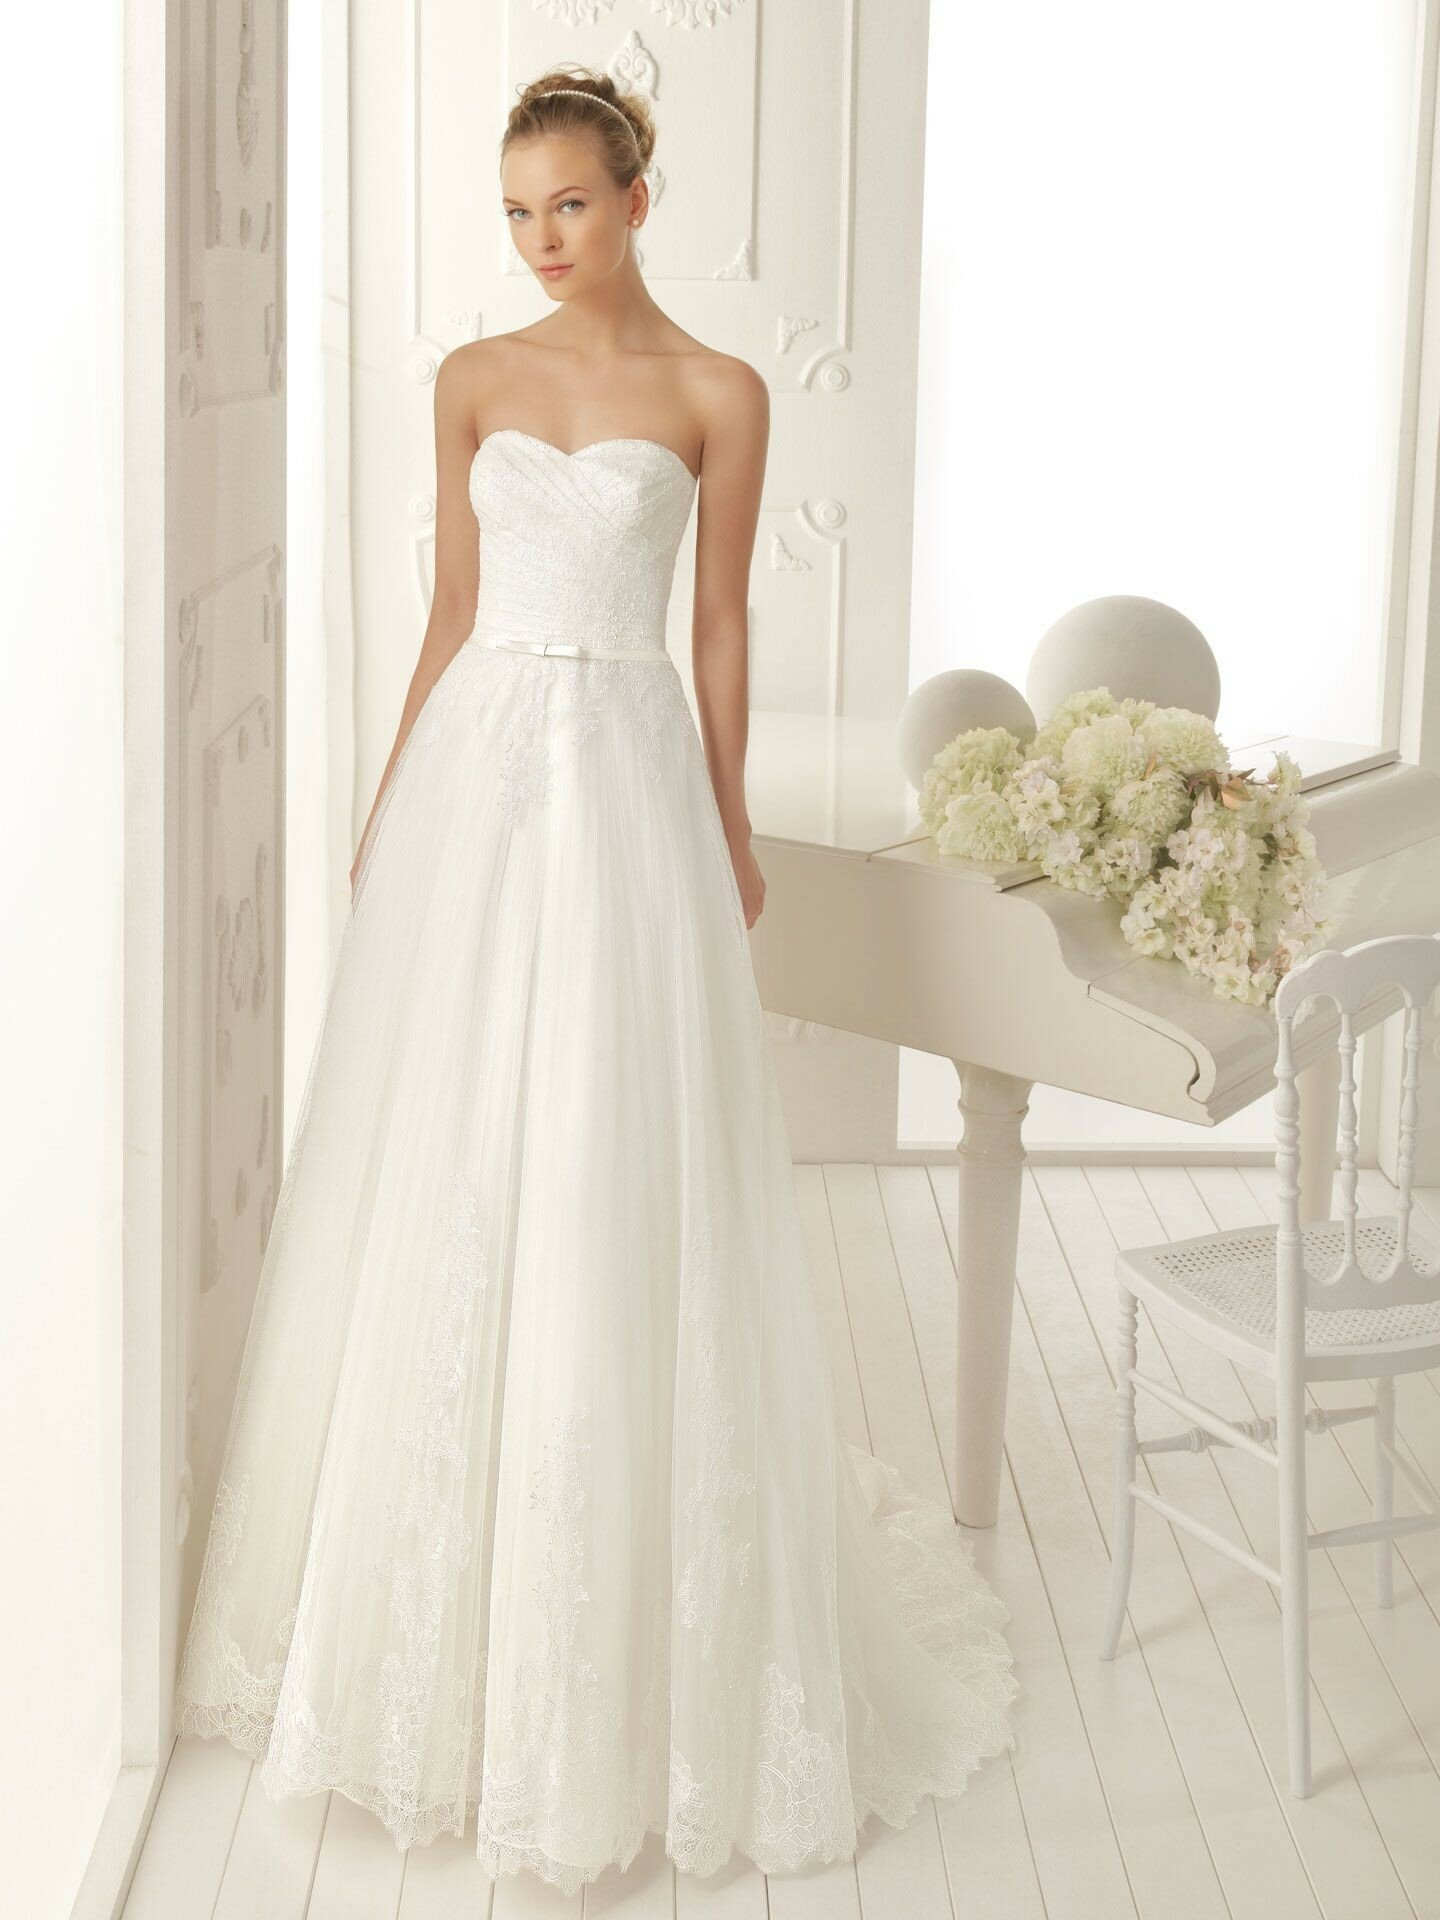 A Line Style Wedding Dresses Photo 5